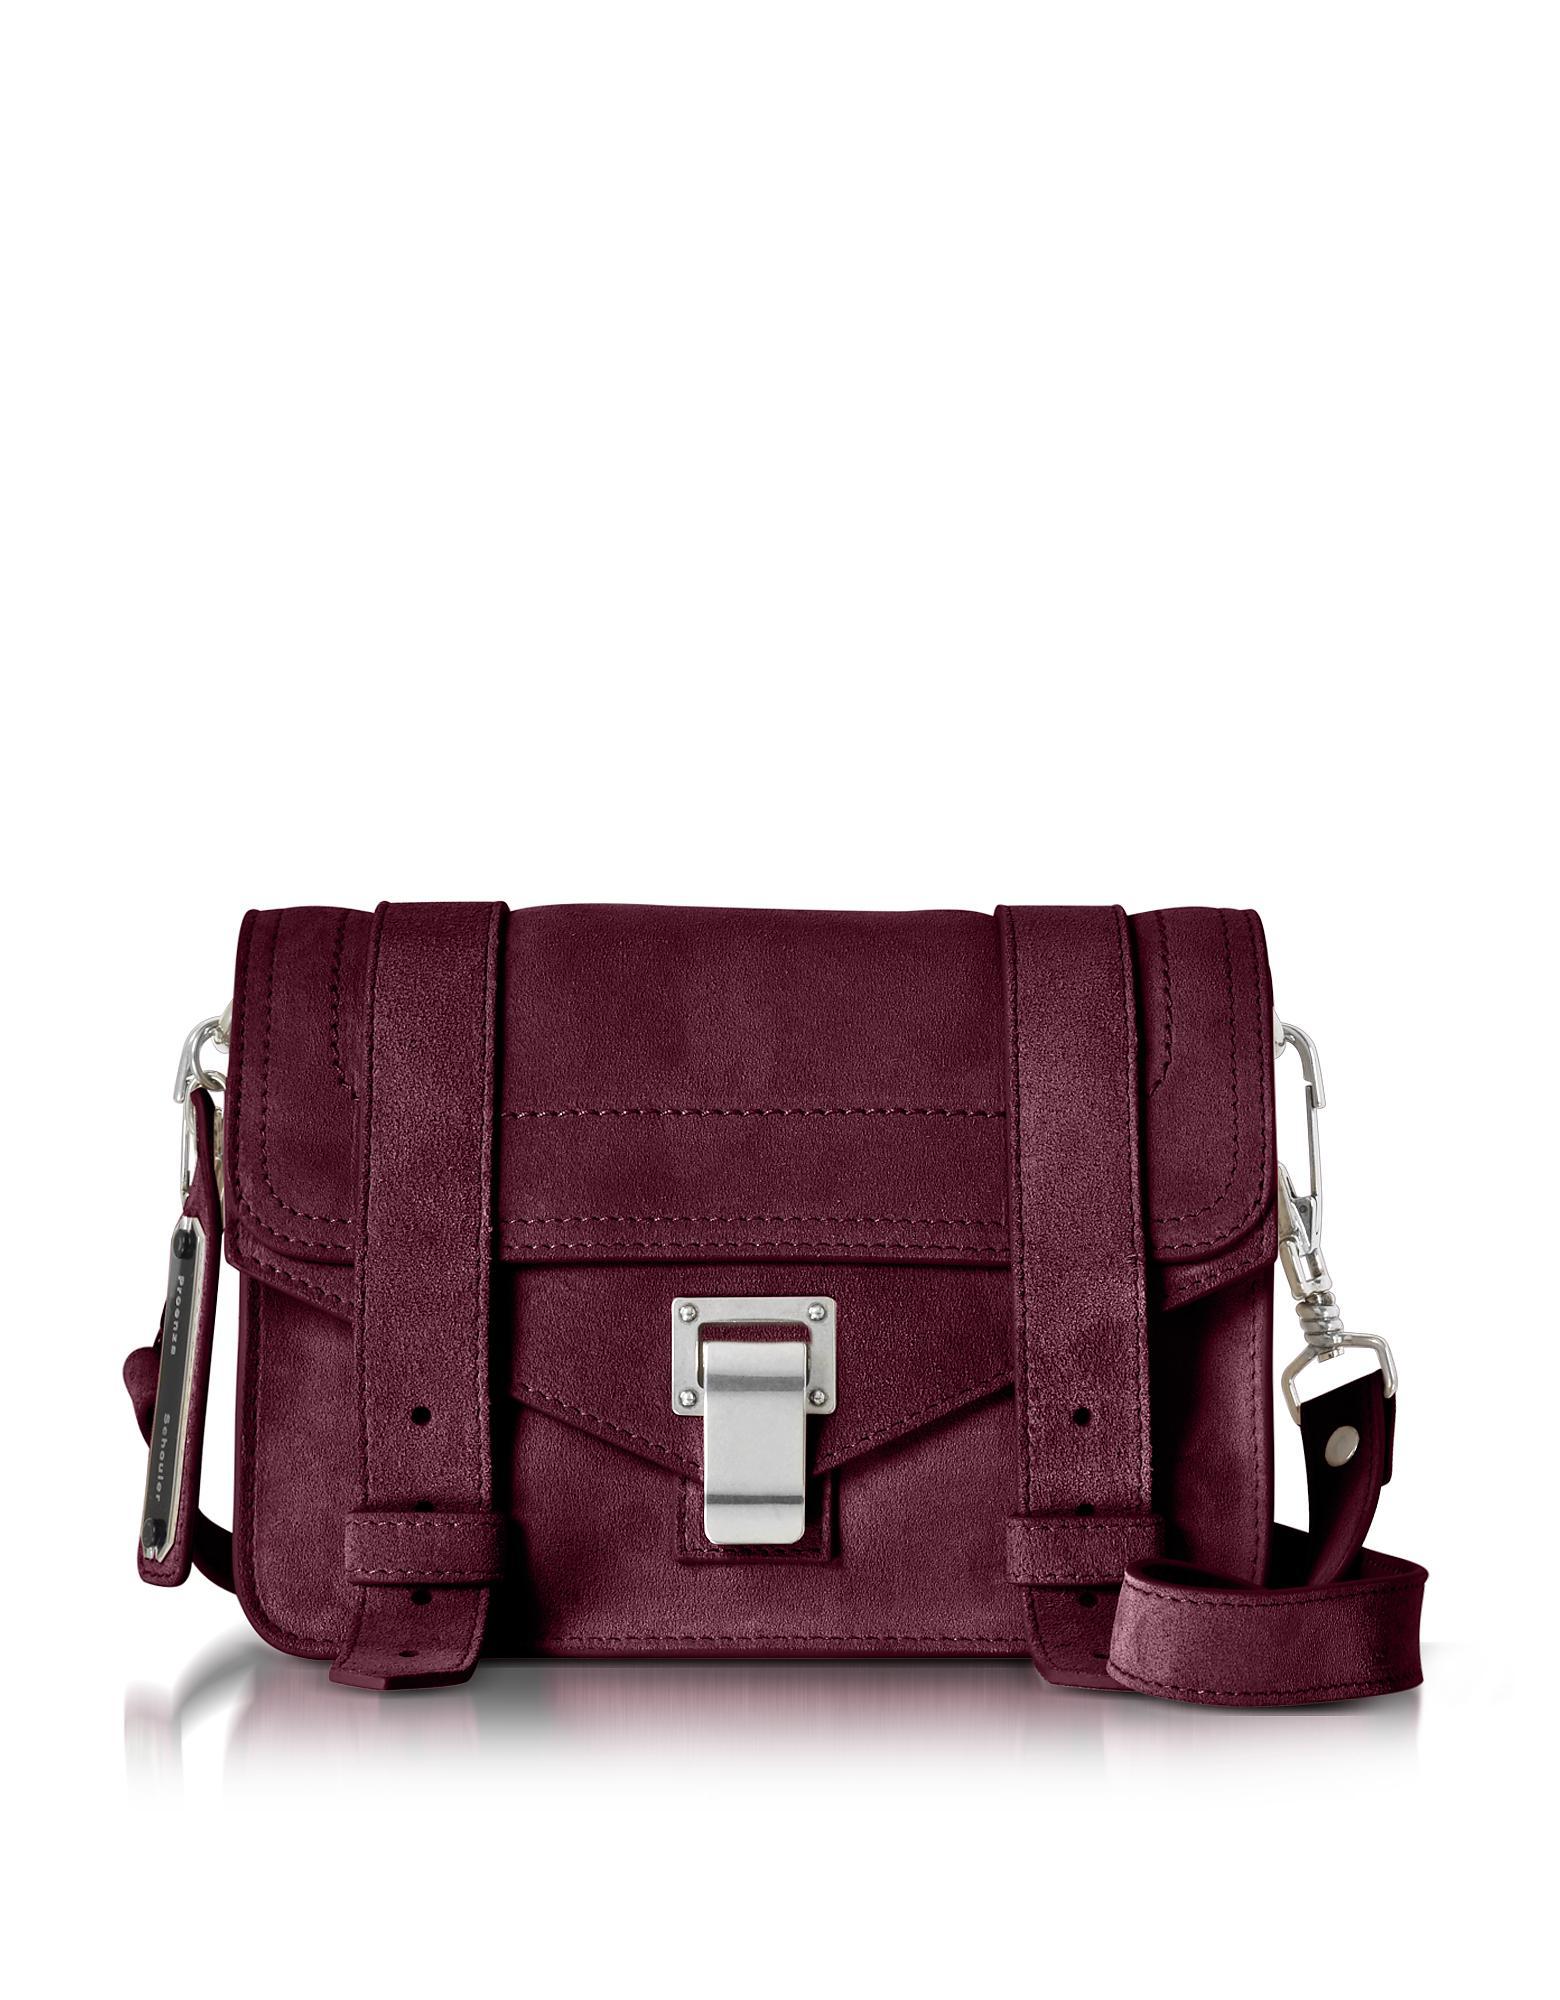 Proenza Schouler Woman Ps1 Eyelet-embellished Suede Shoulder Bag Purple Size Proenza Schouler Clearance Sale Sale Best YW6JXqsO